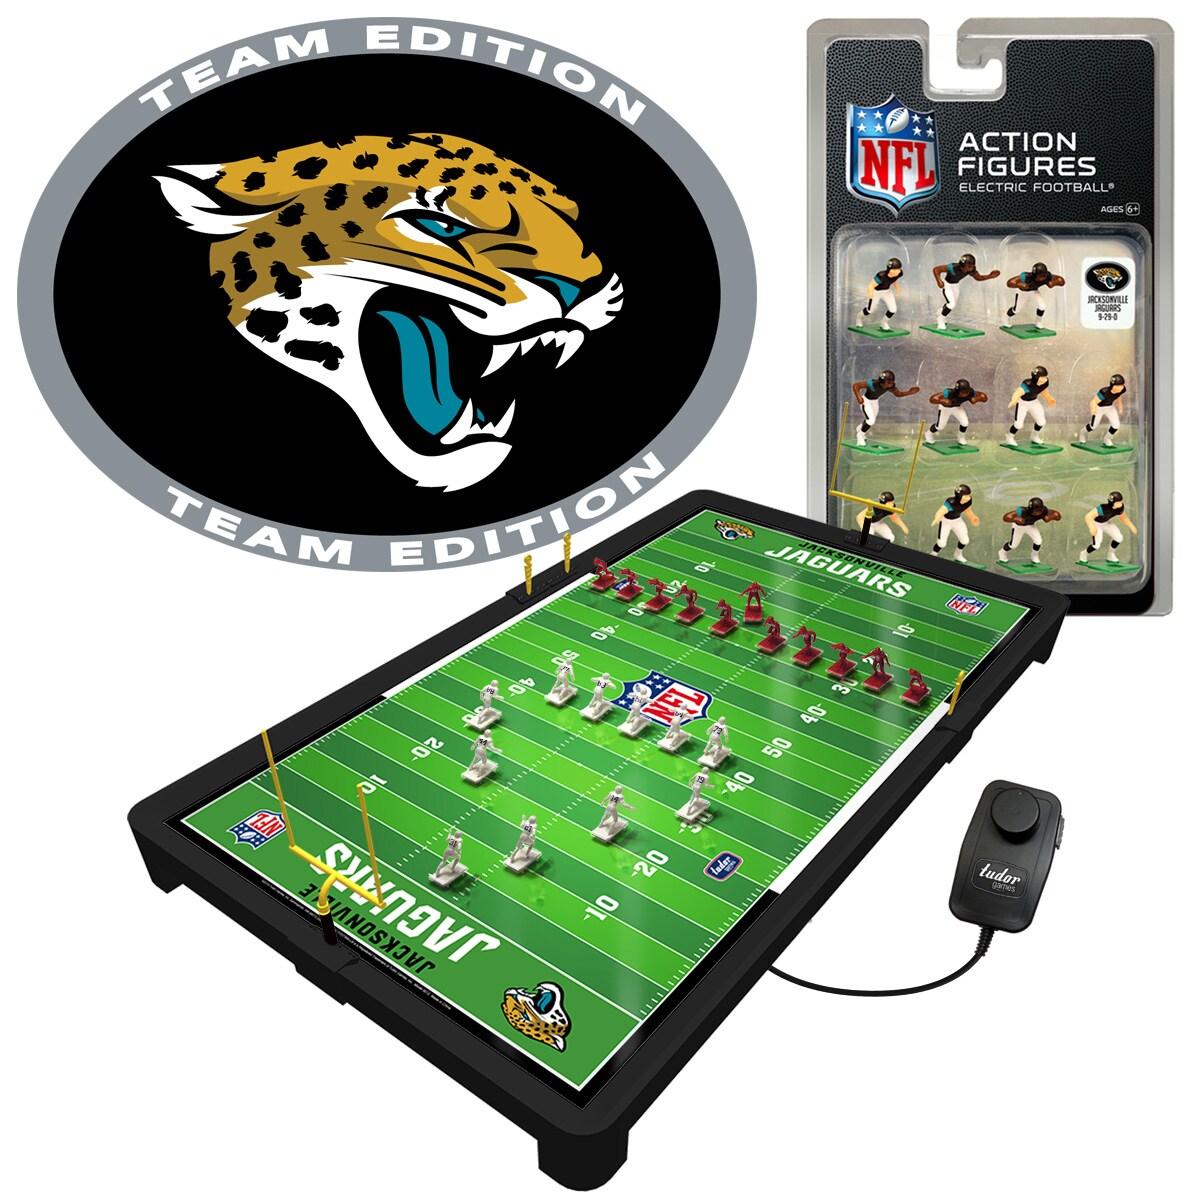 Jacksonville Jaguars Electric Football Game